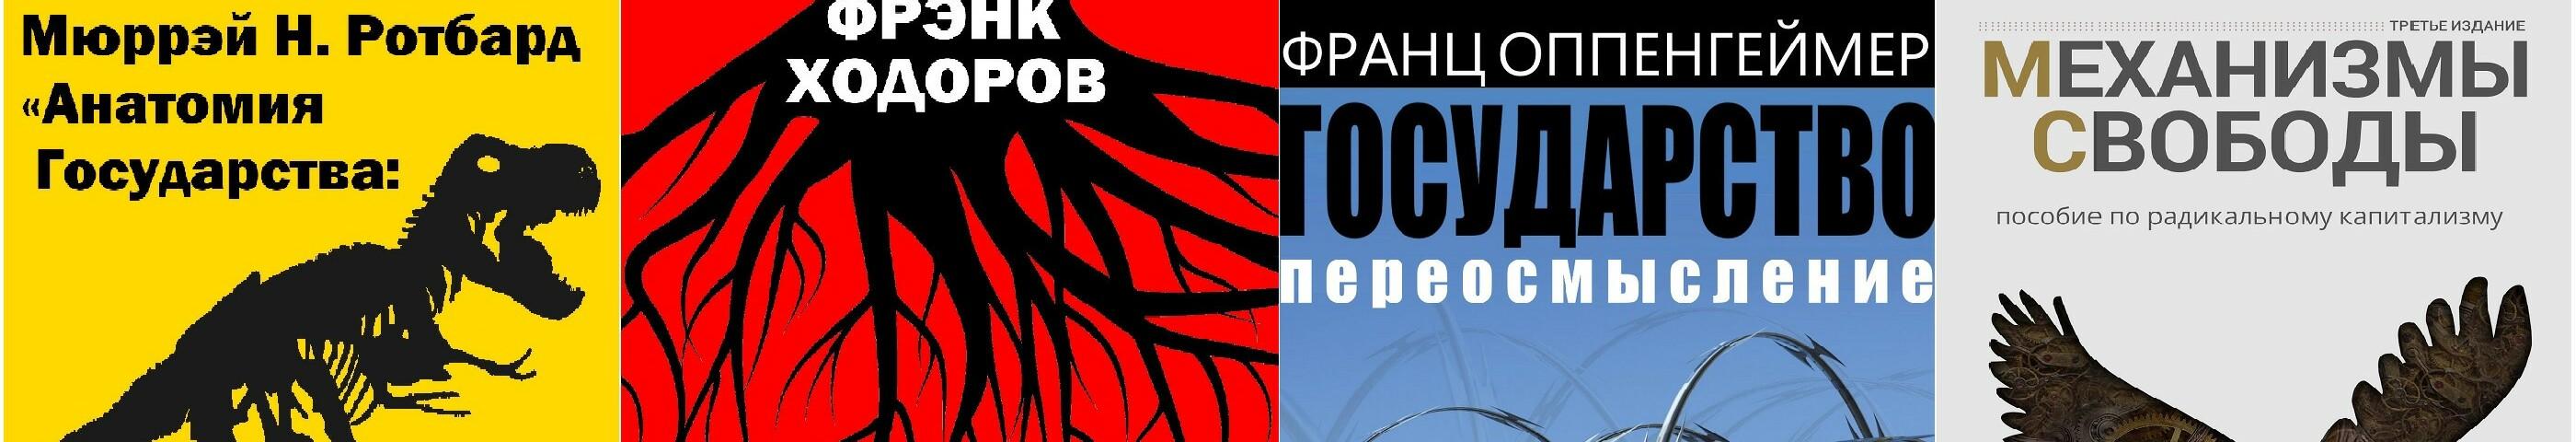 creator cover Liberbook